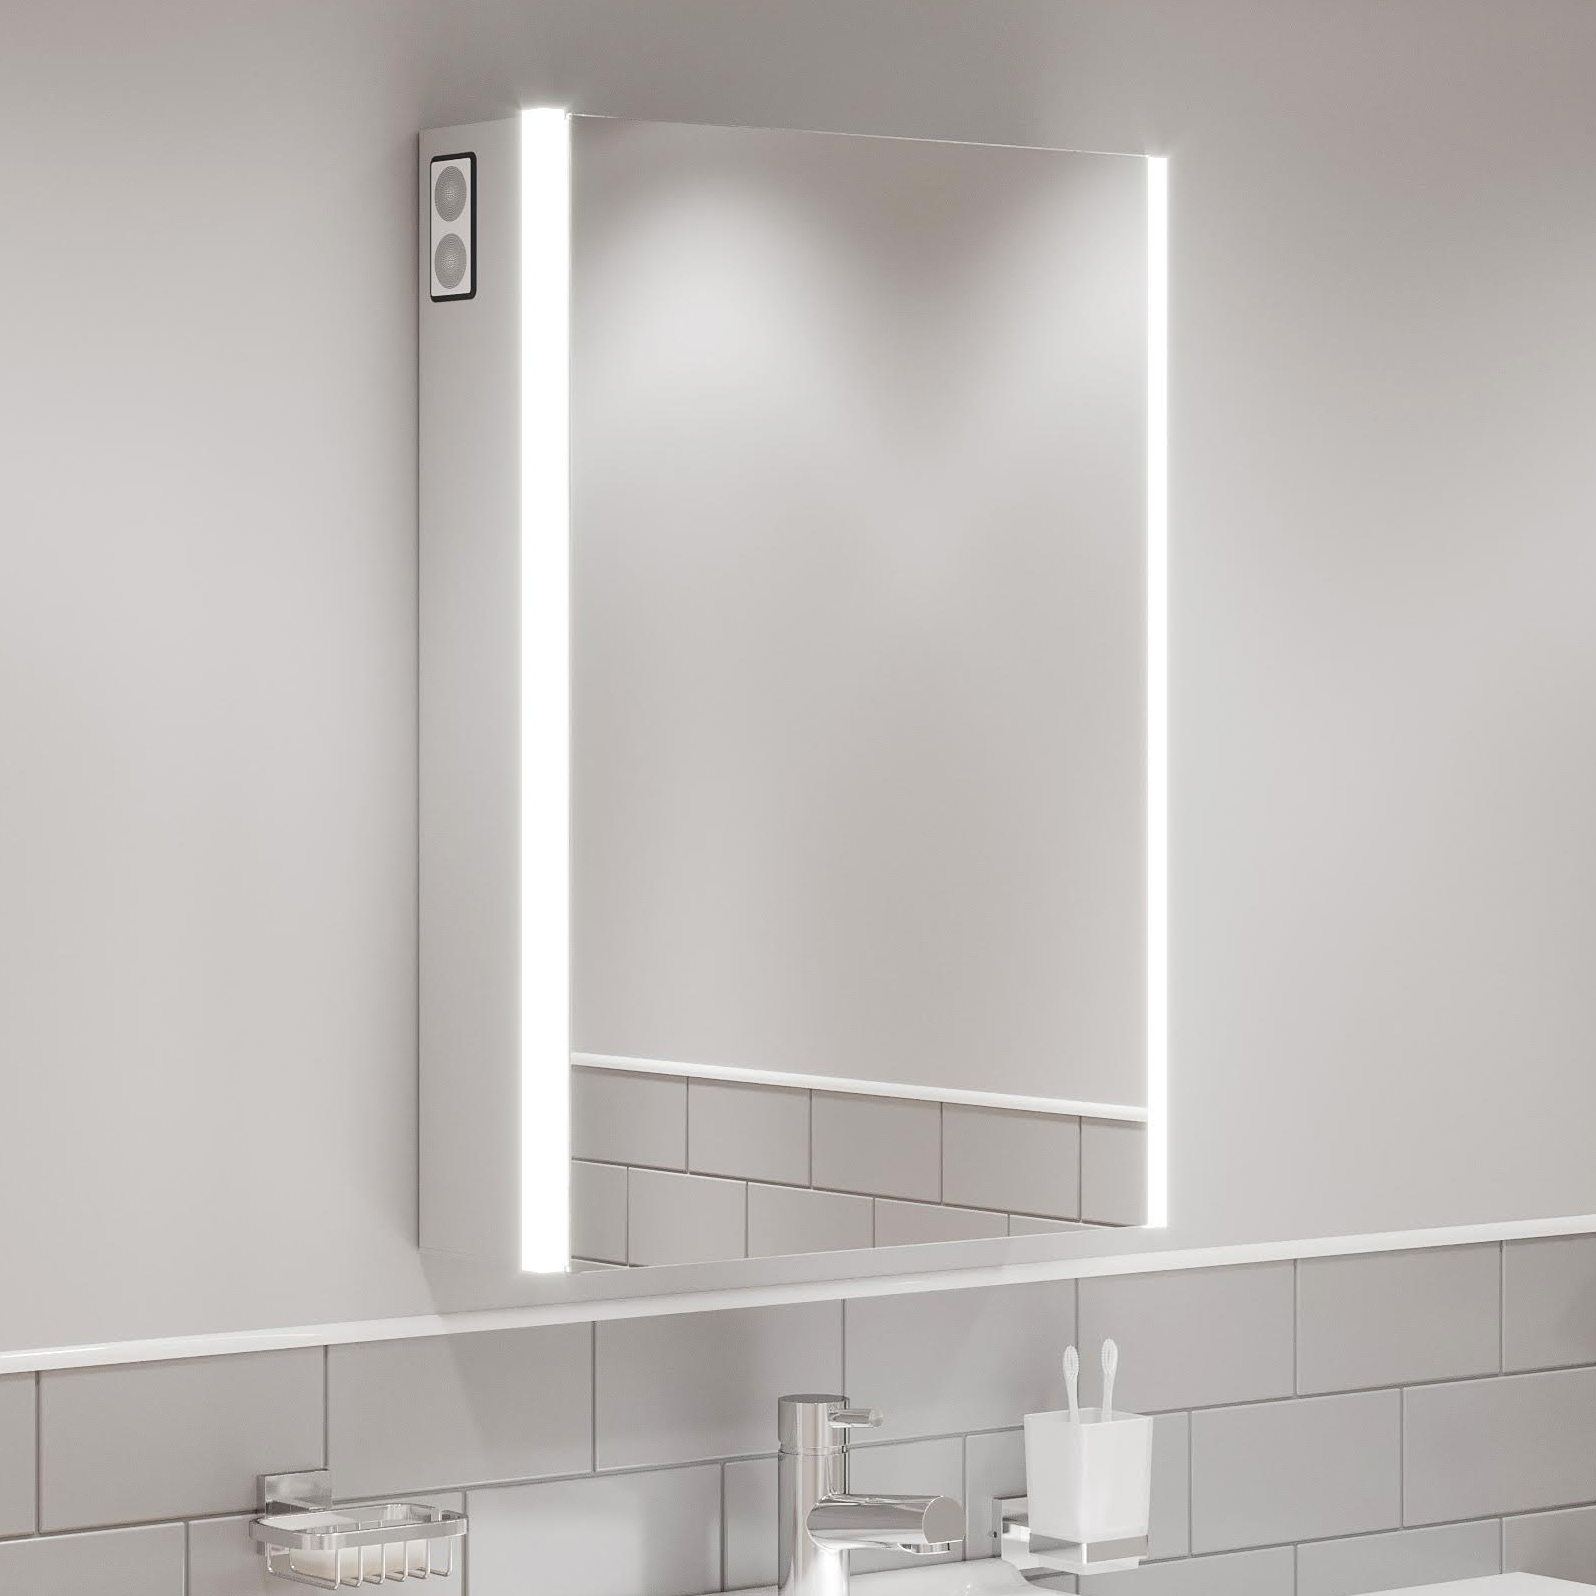 Bathroom Led Mirror Cabinet Shaver Socket Bluetooth Speakers Ip44 700 X 500mm Ebay